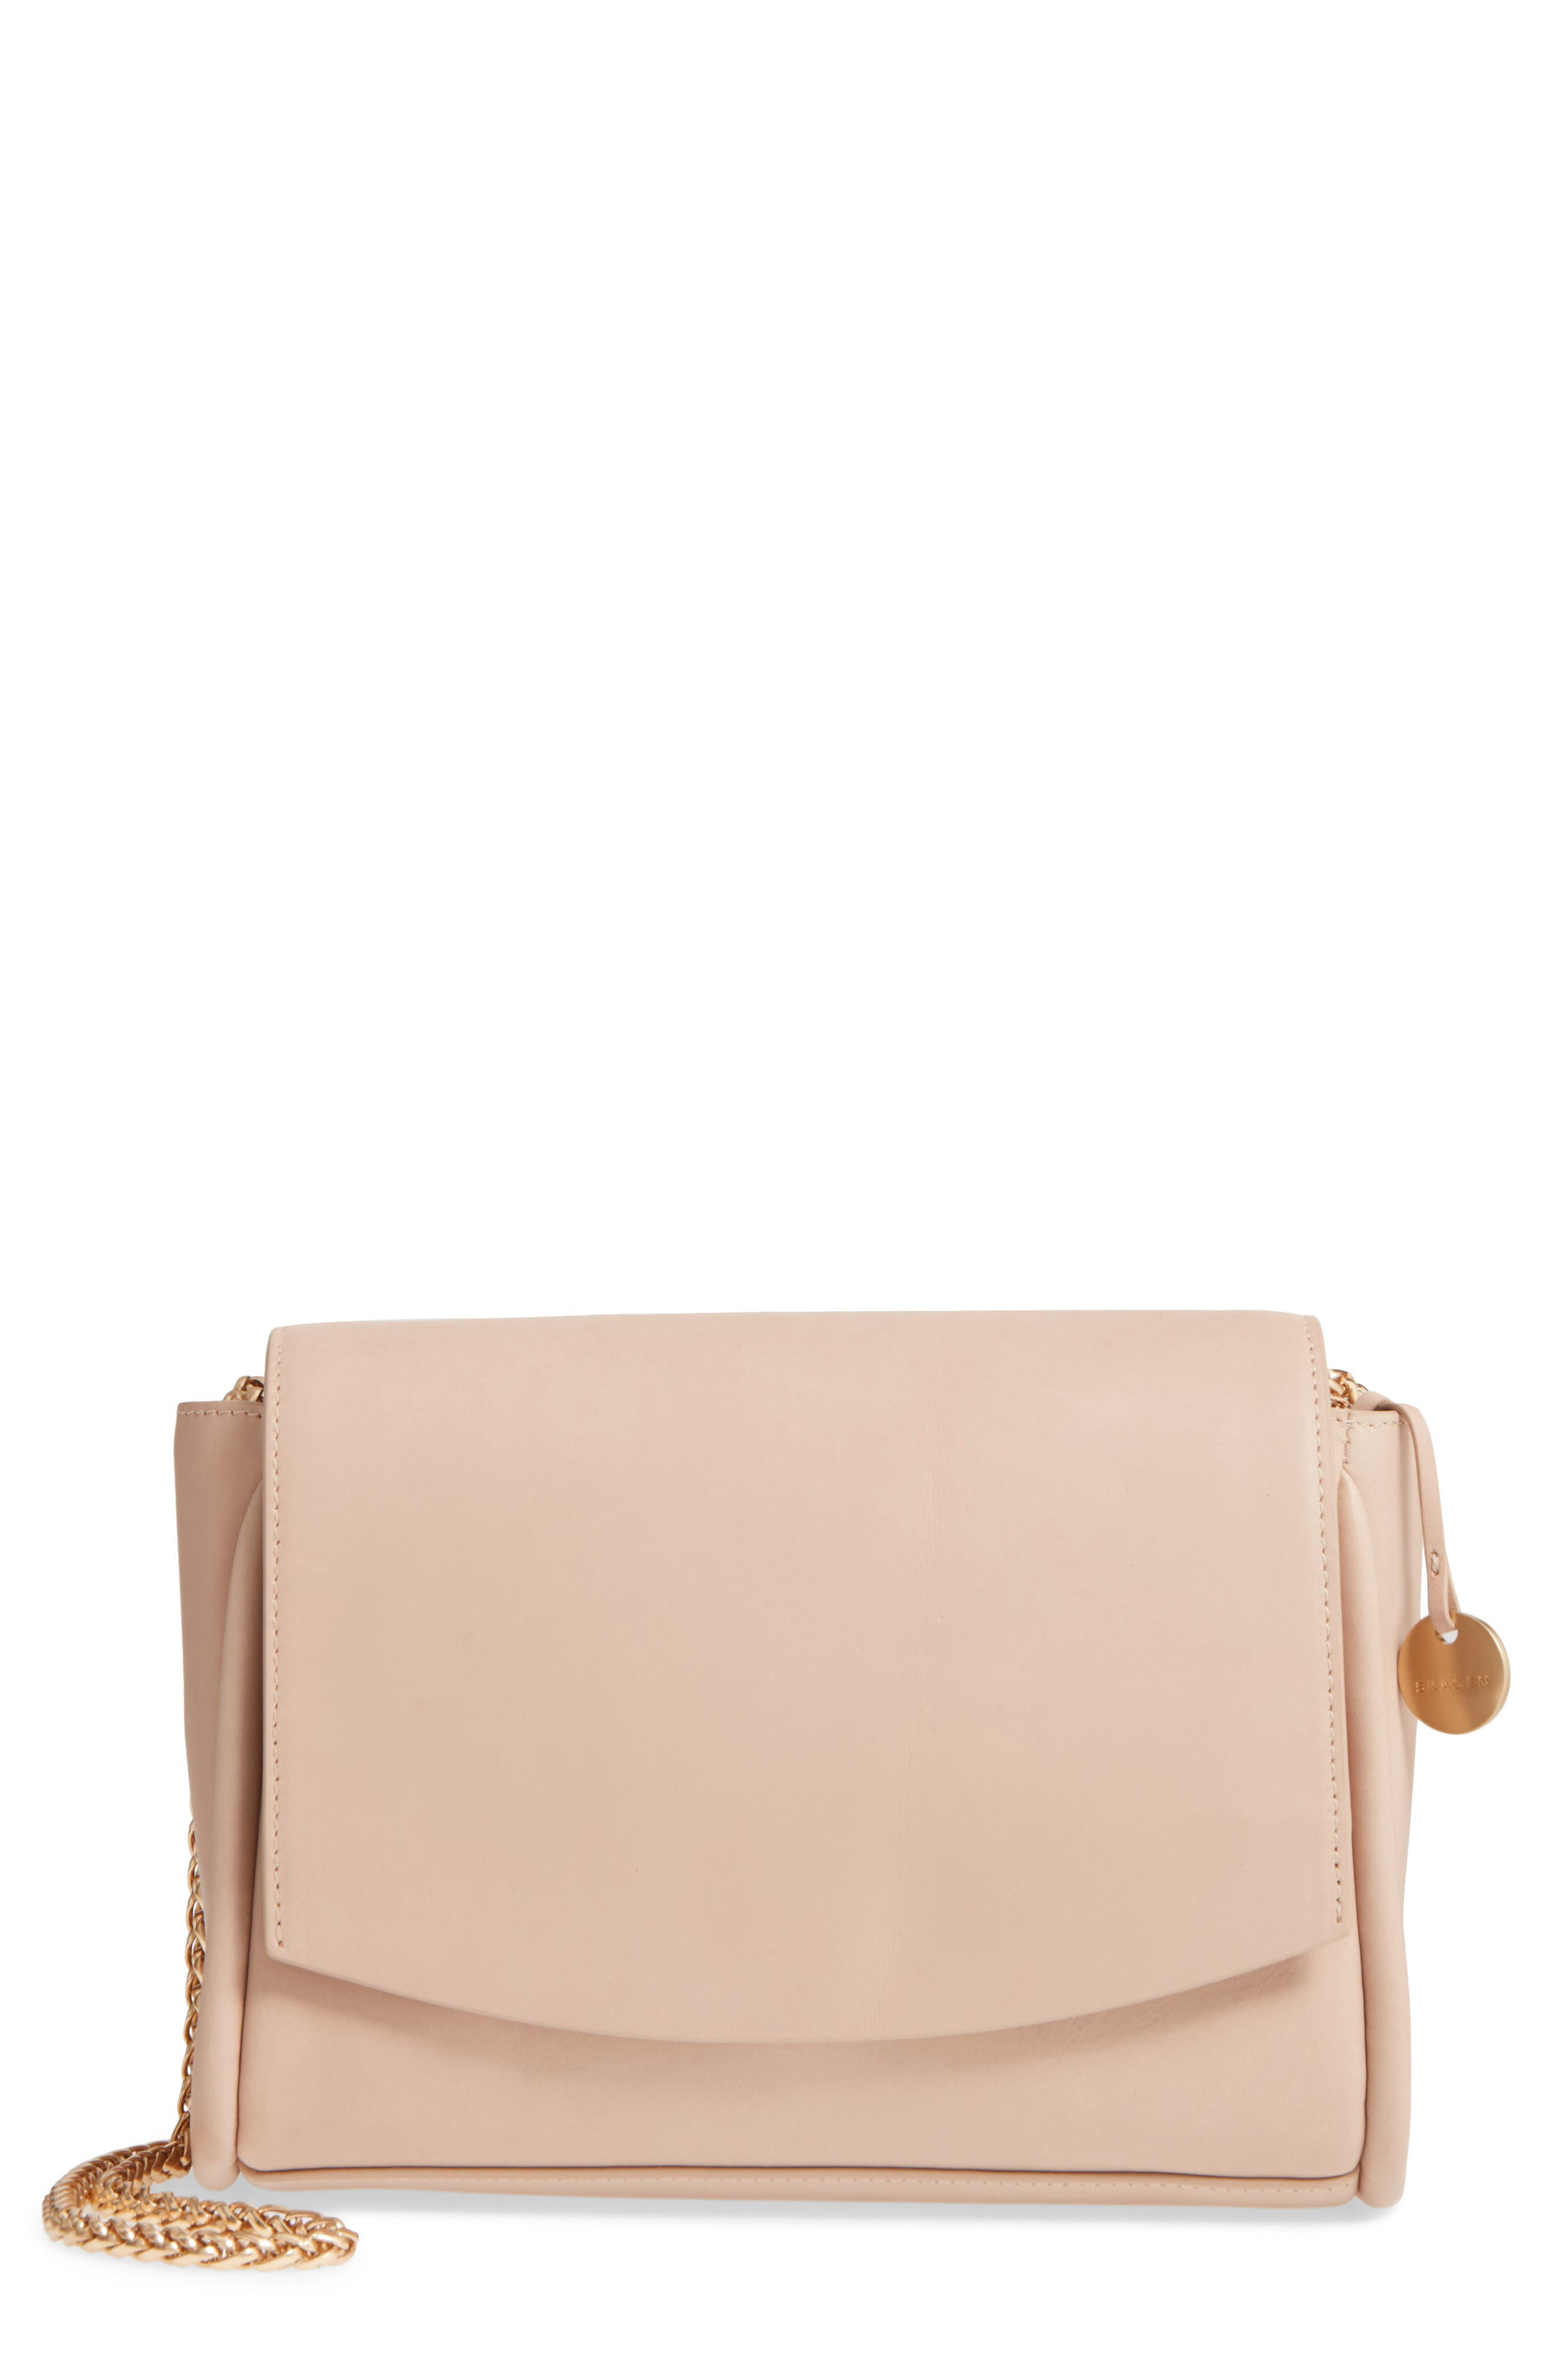 Main Image - Skagen Sylvi Calfskin Leather Crossbody Bag